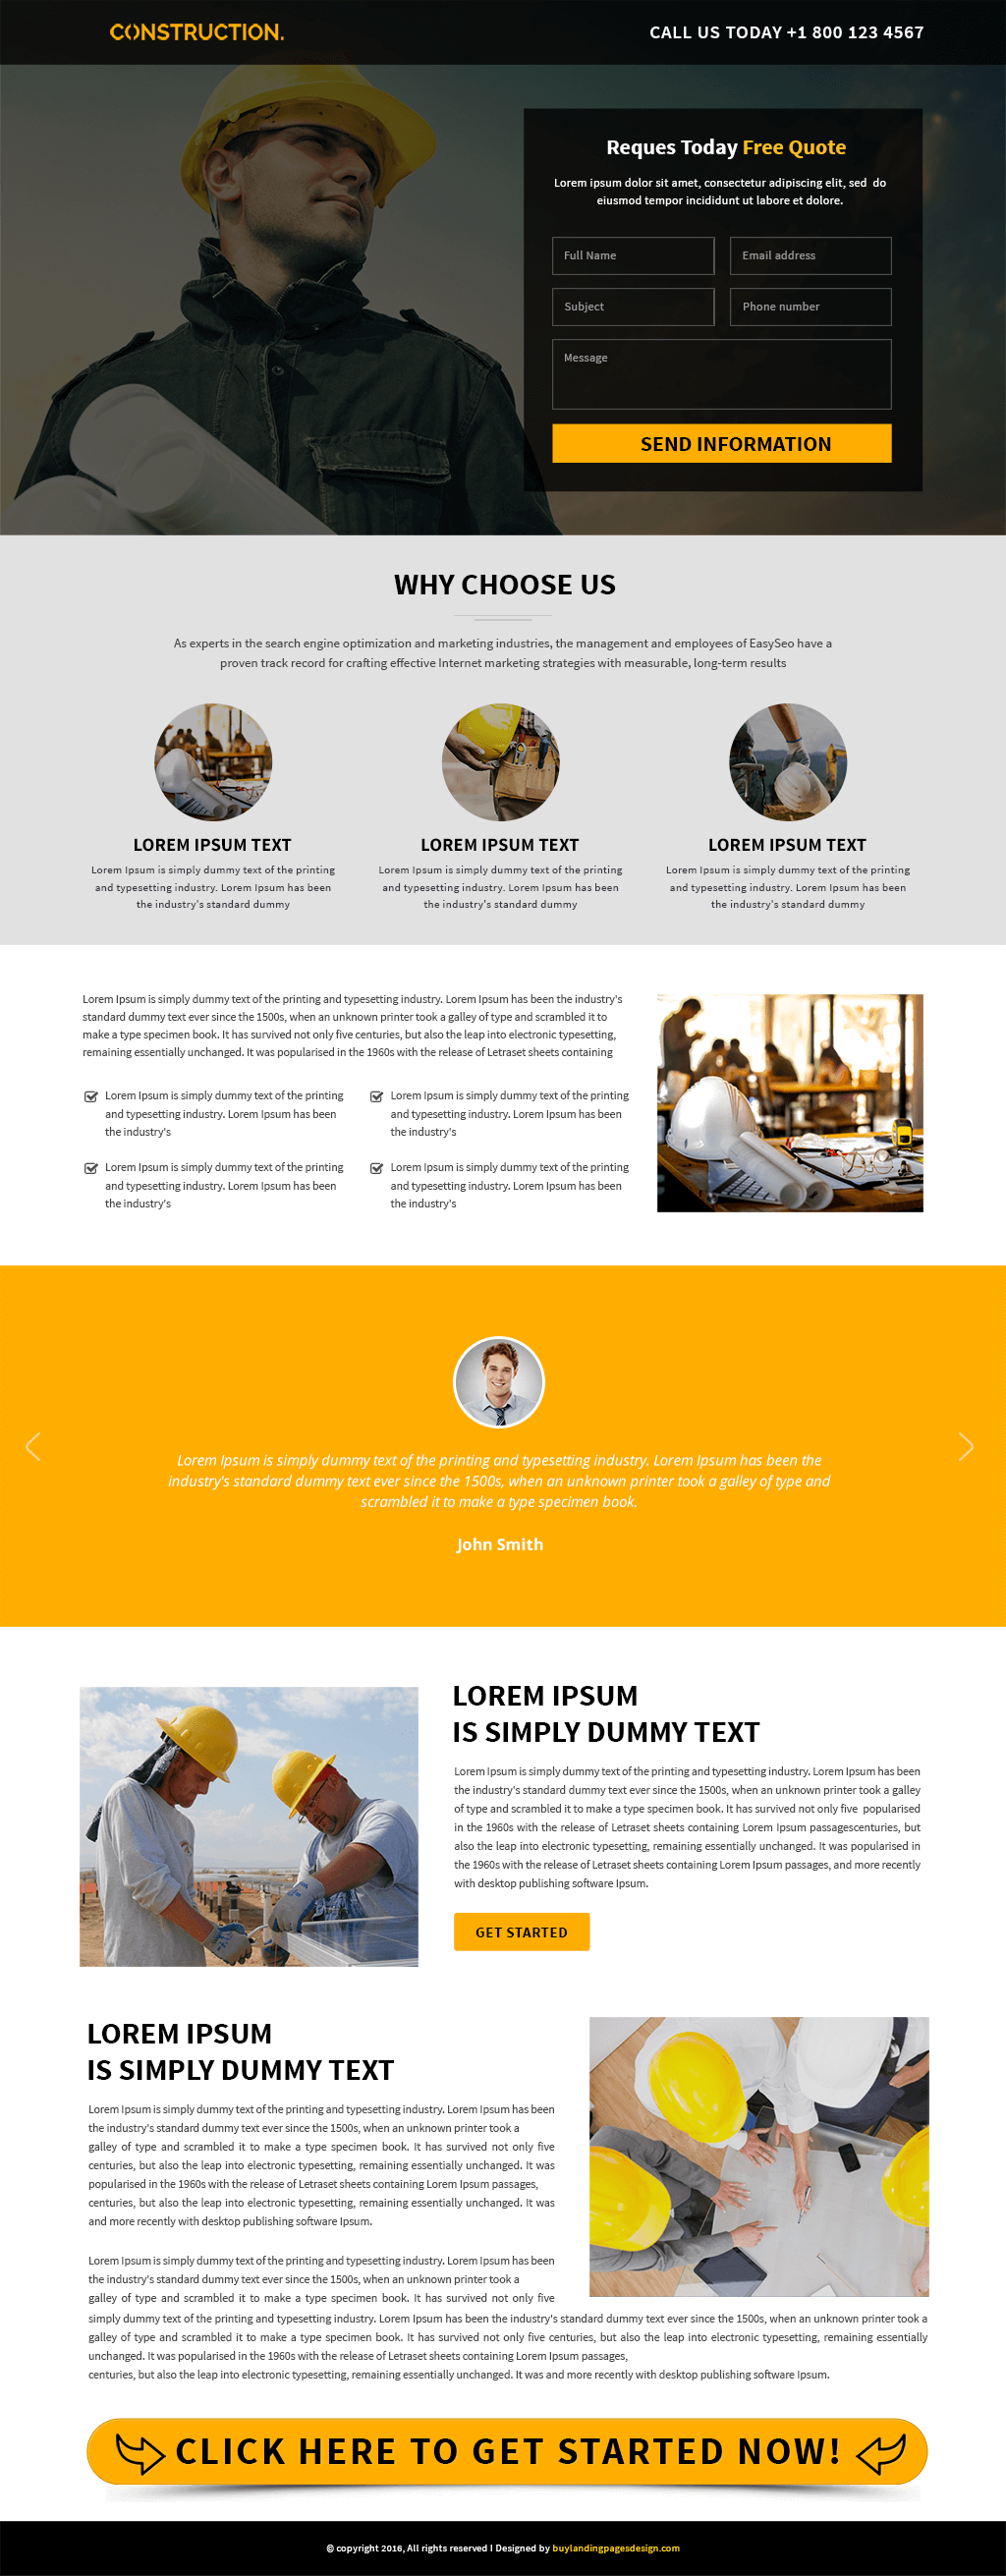 Responsive Construction Service Landing Page Design Template